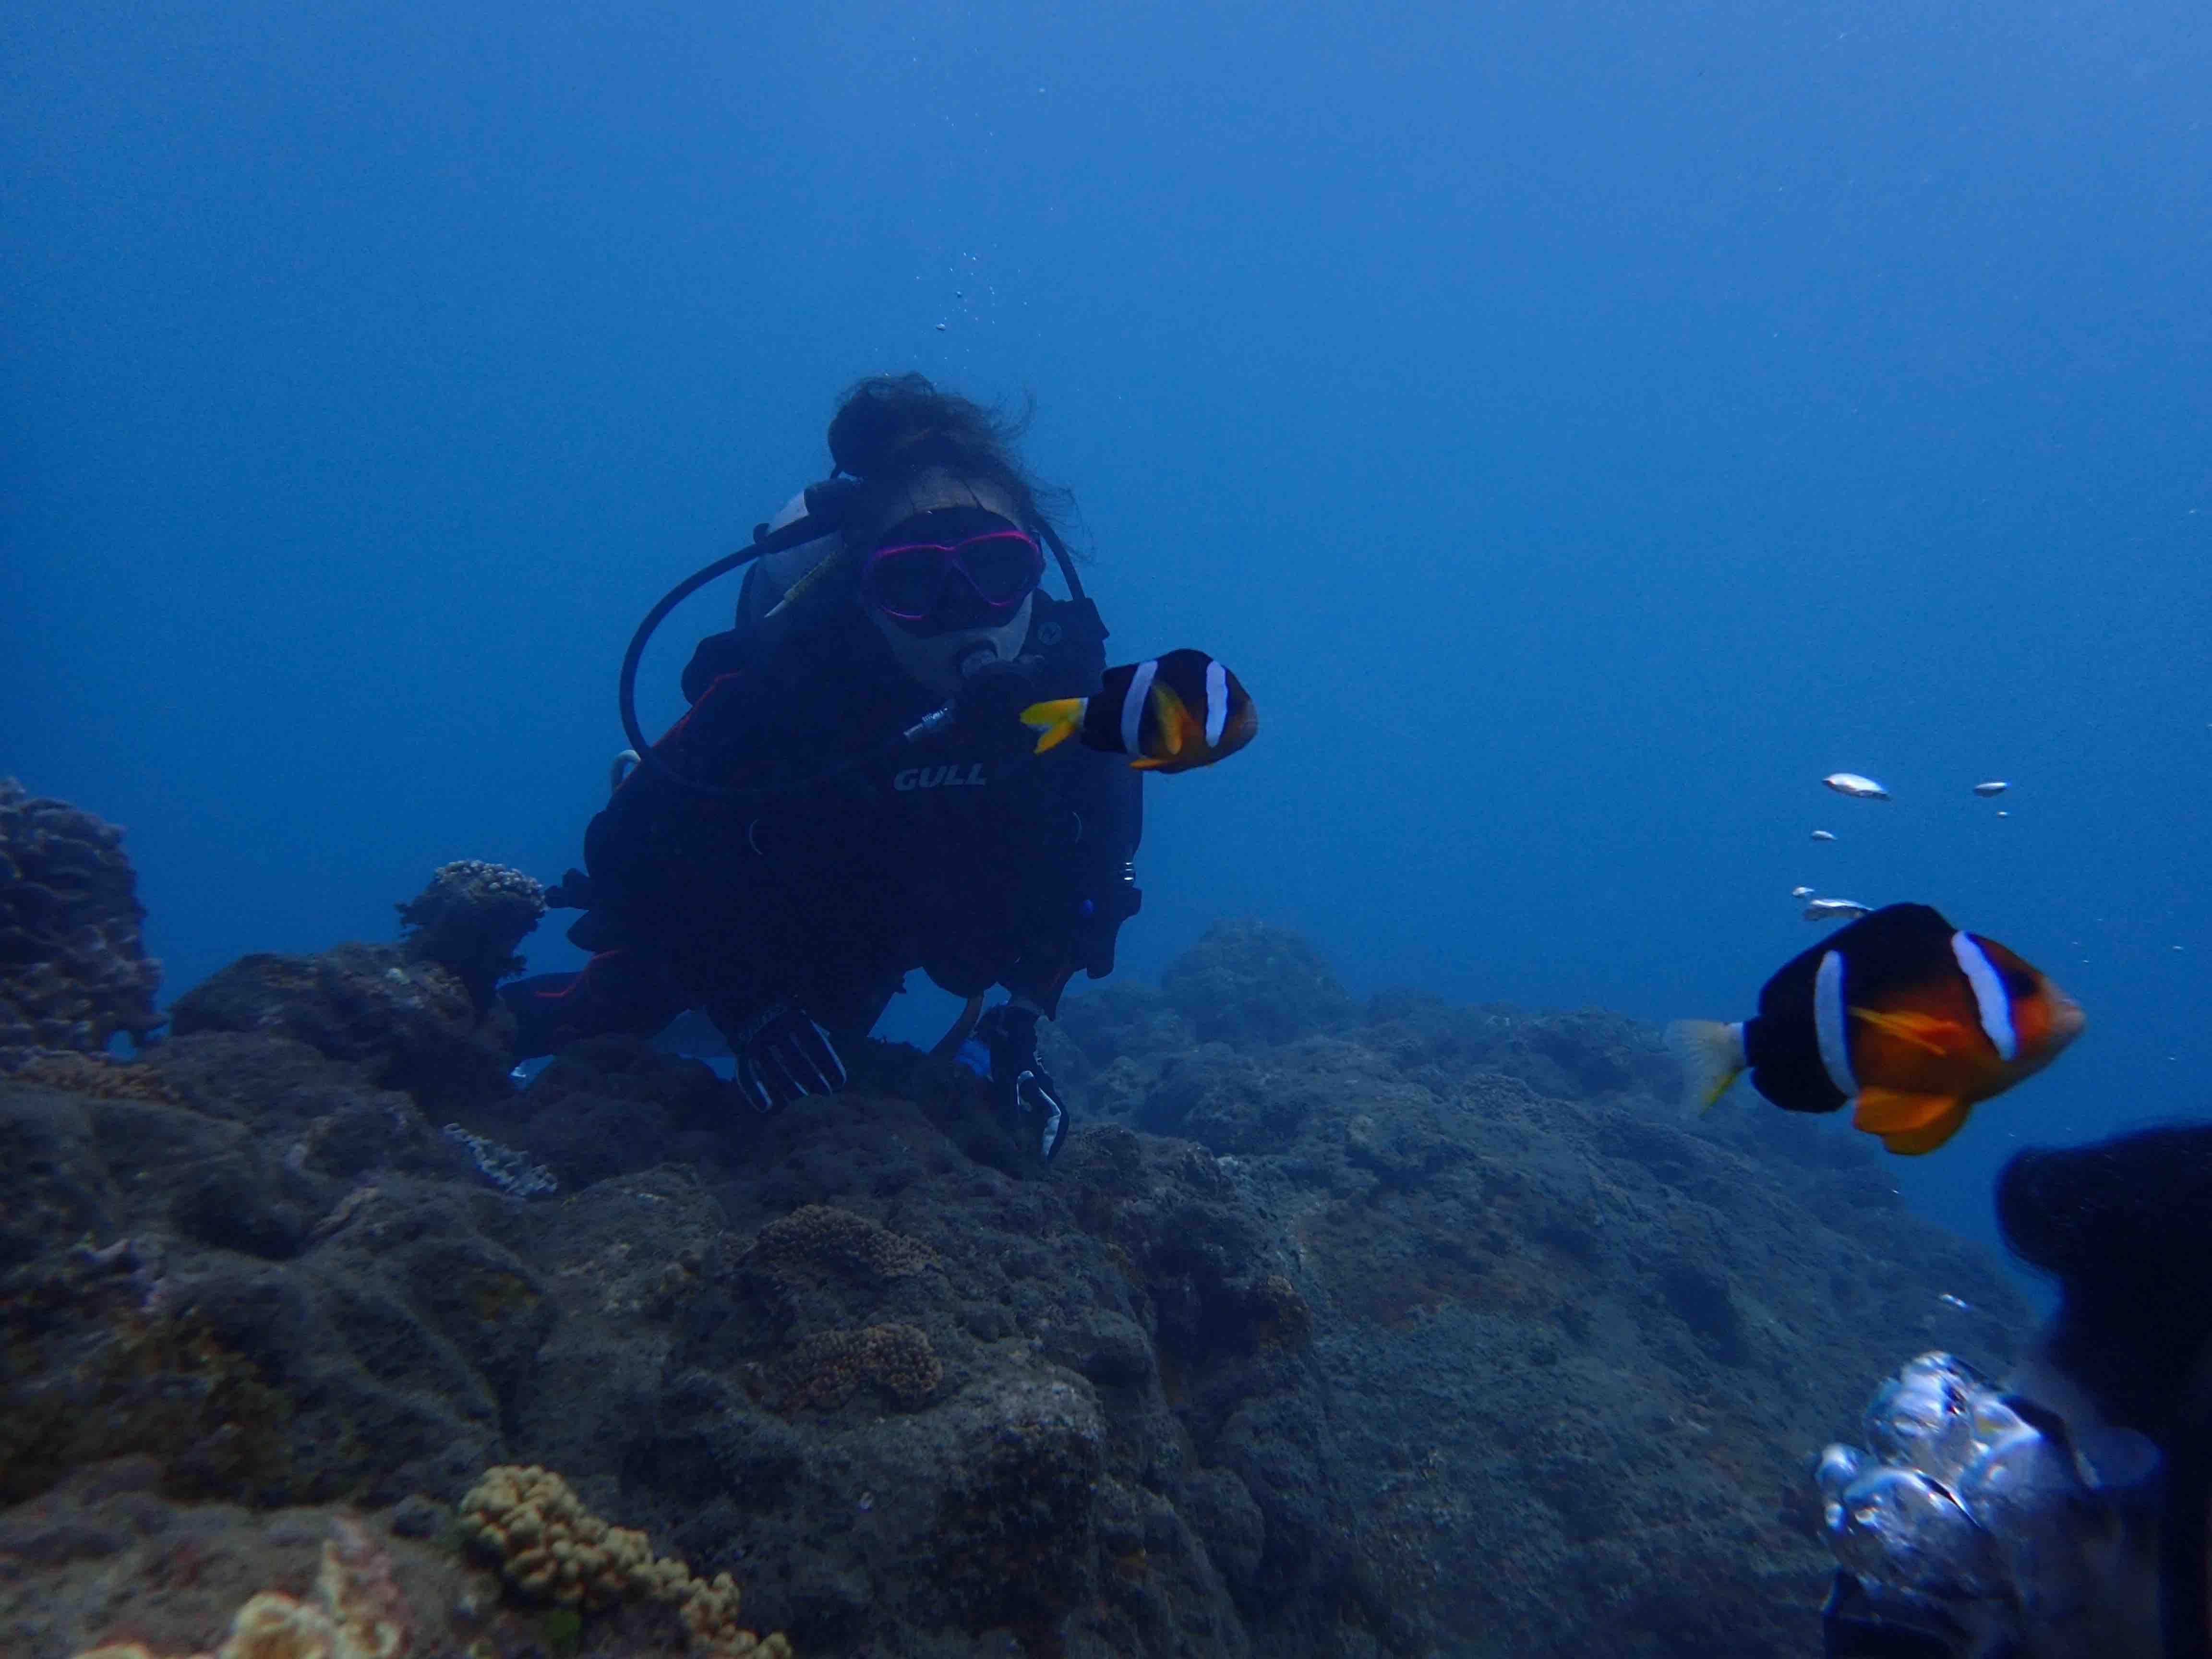 http://www.aquamarine-dive.net/blog/index.html/2015/10/08/0920.jpg